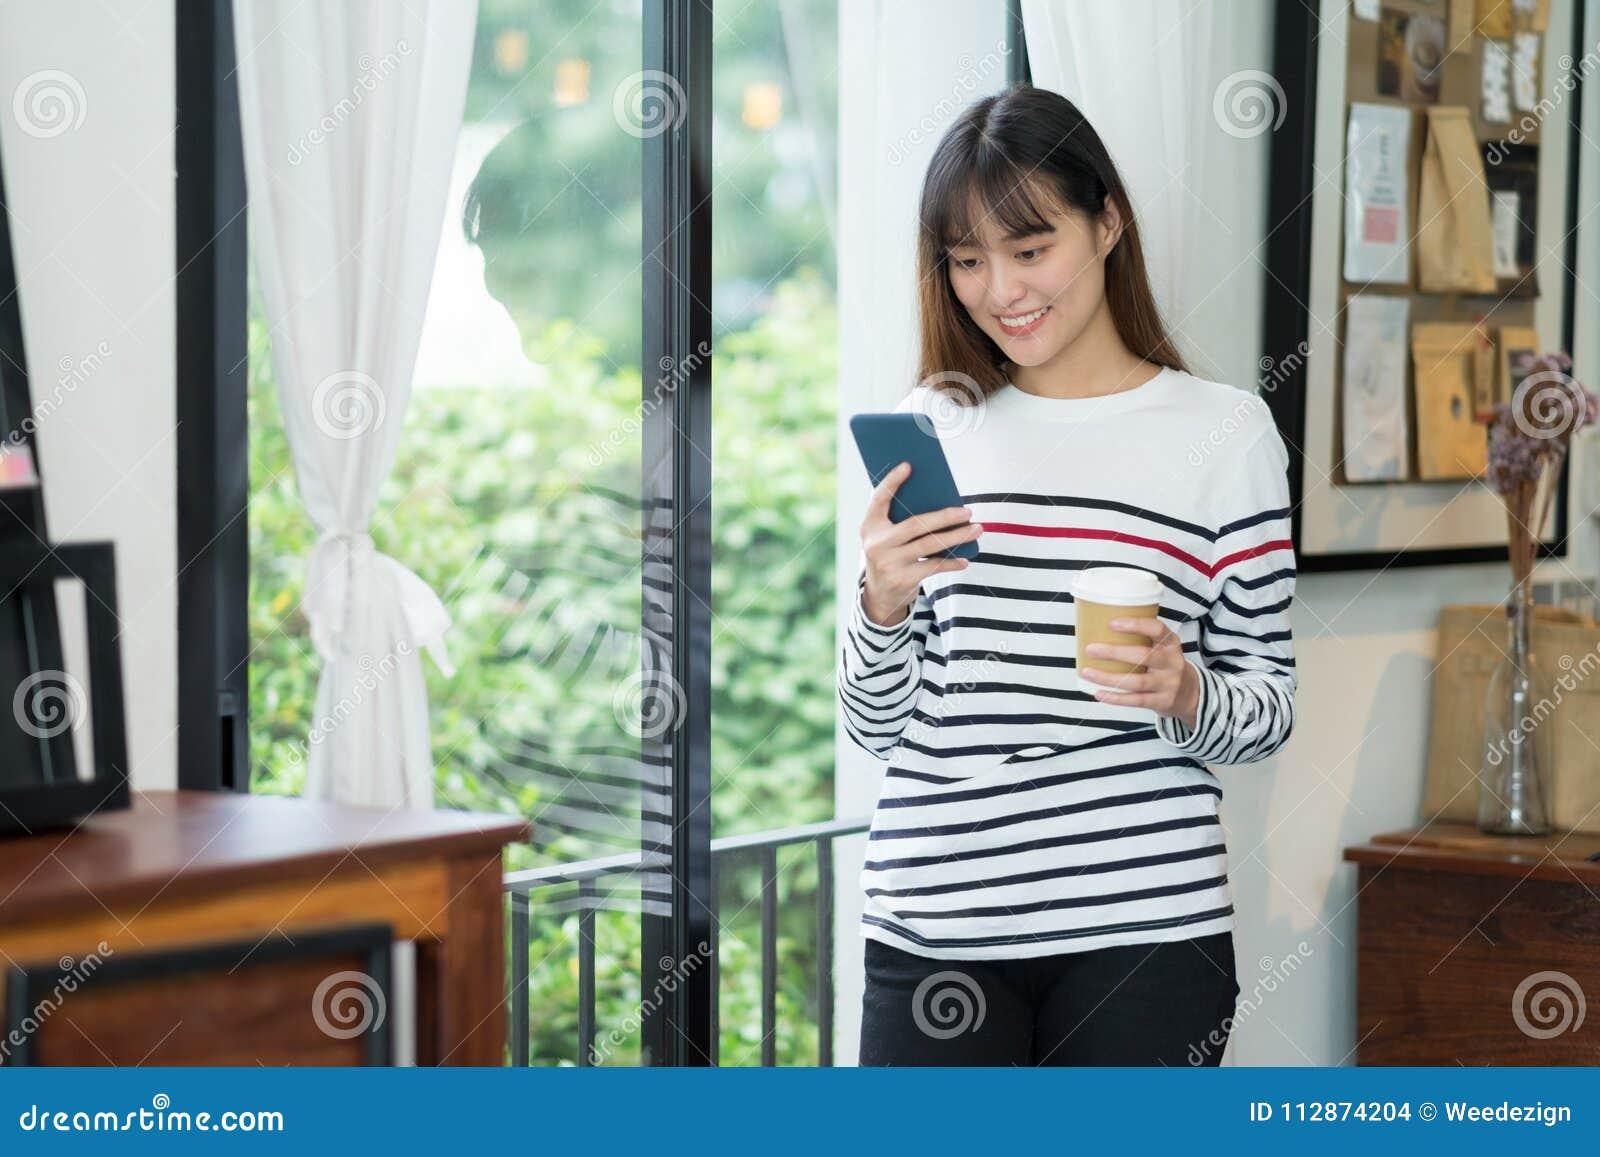 Asian see thru conversations! advise